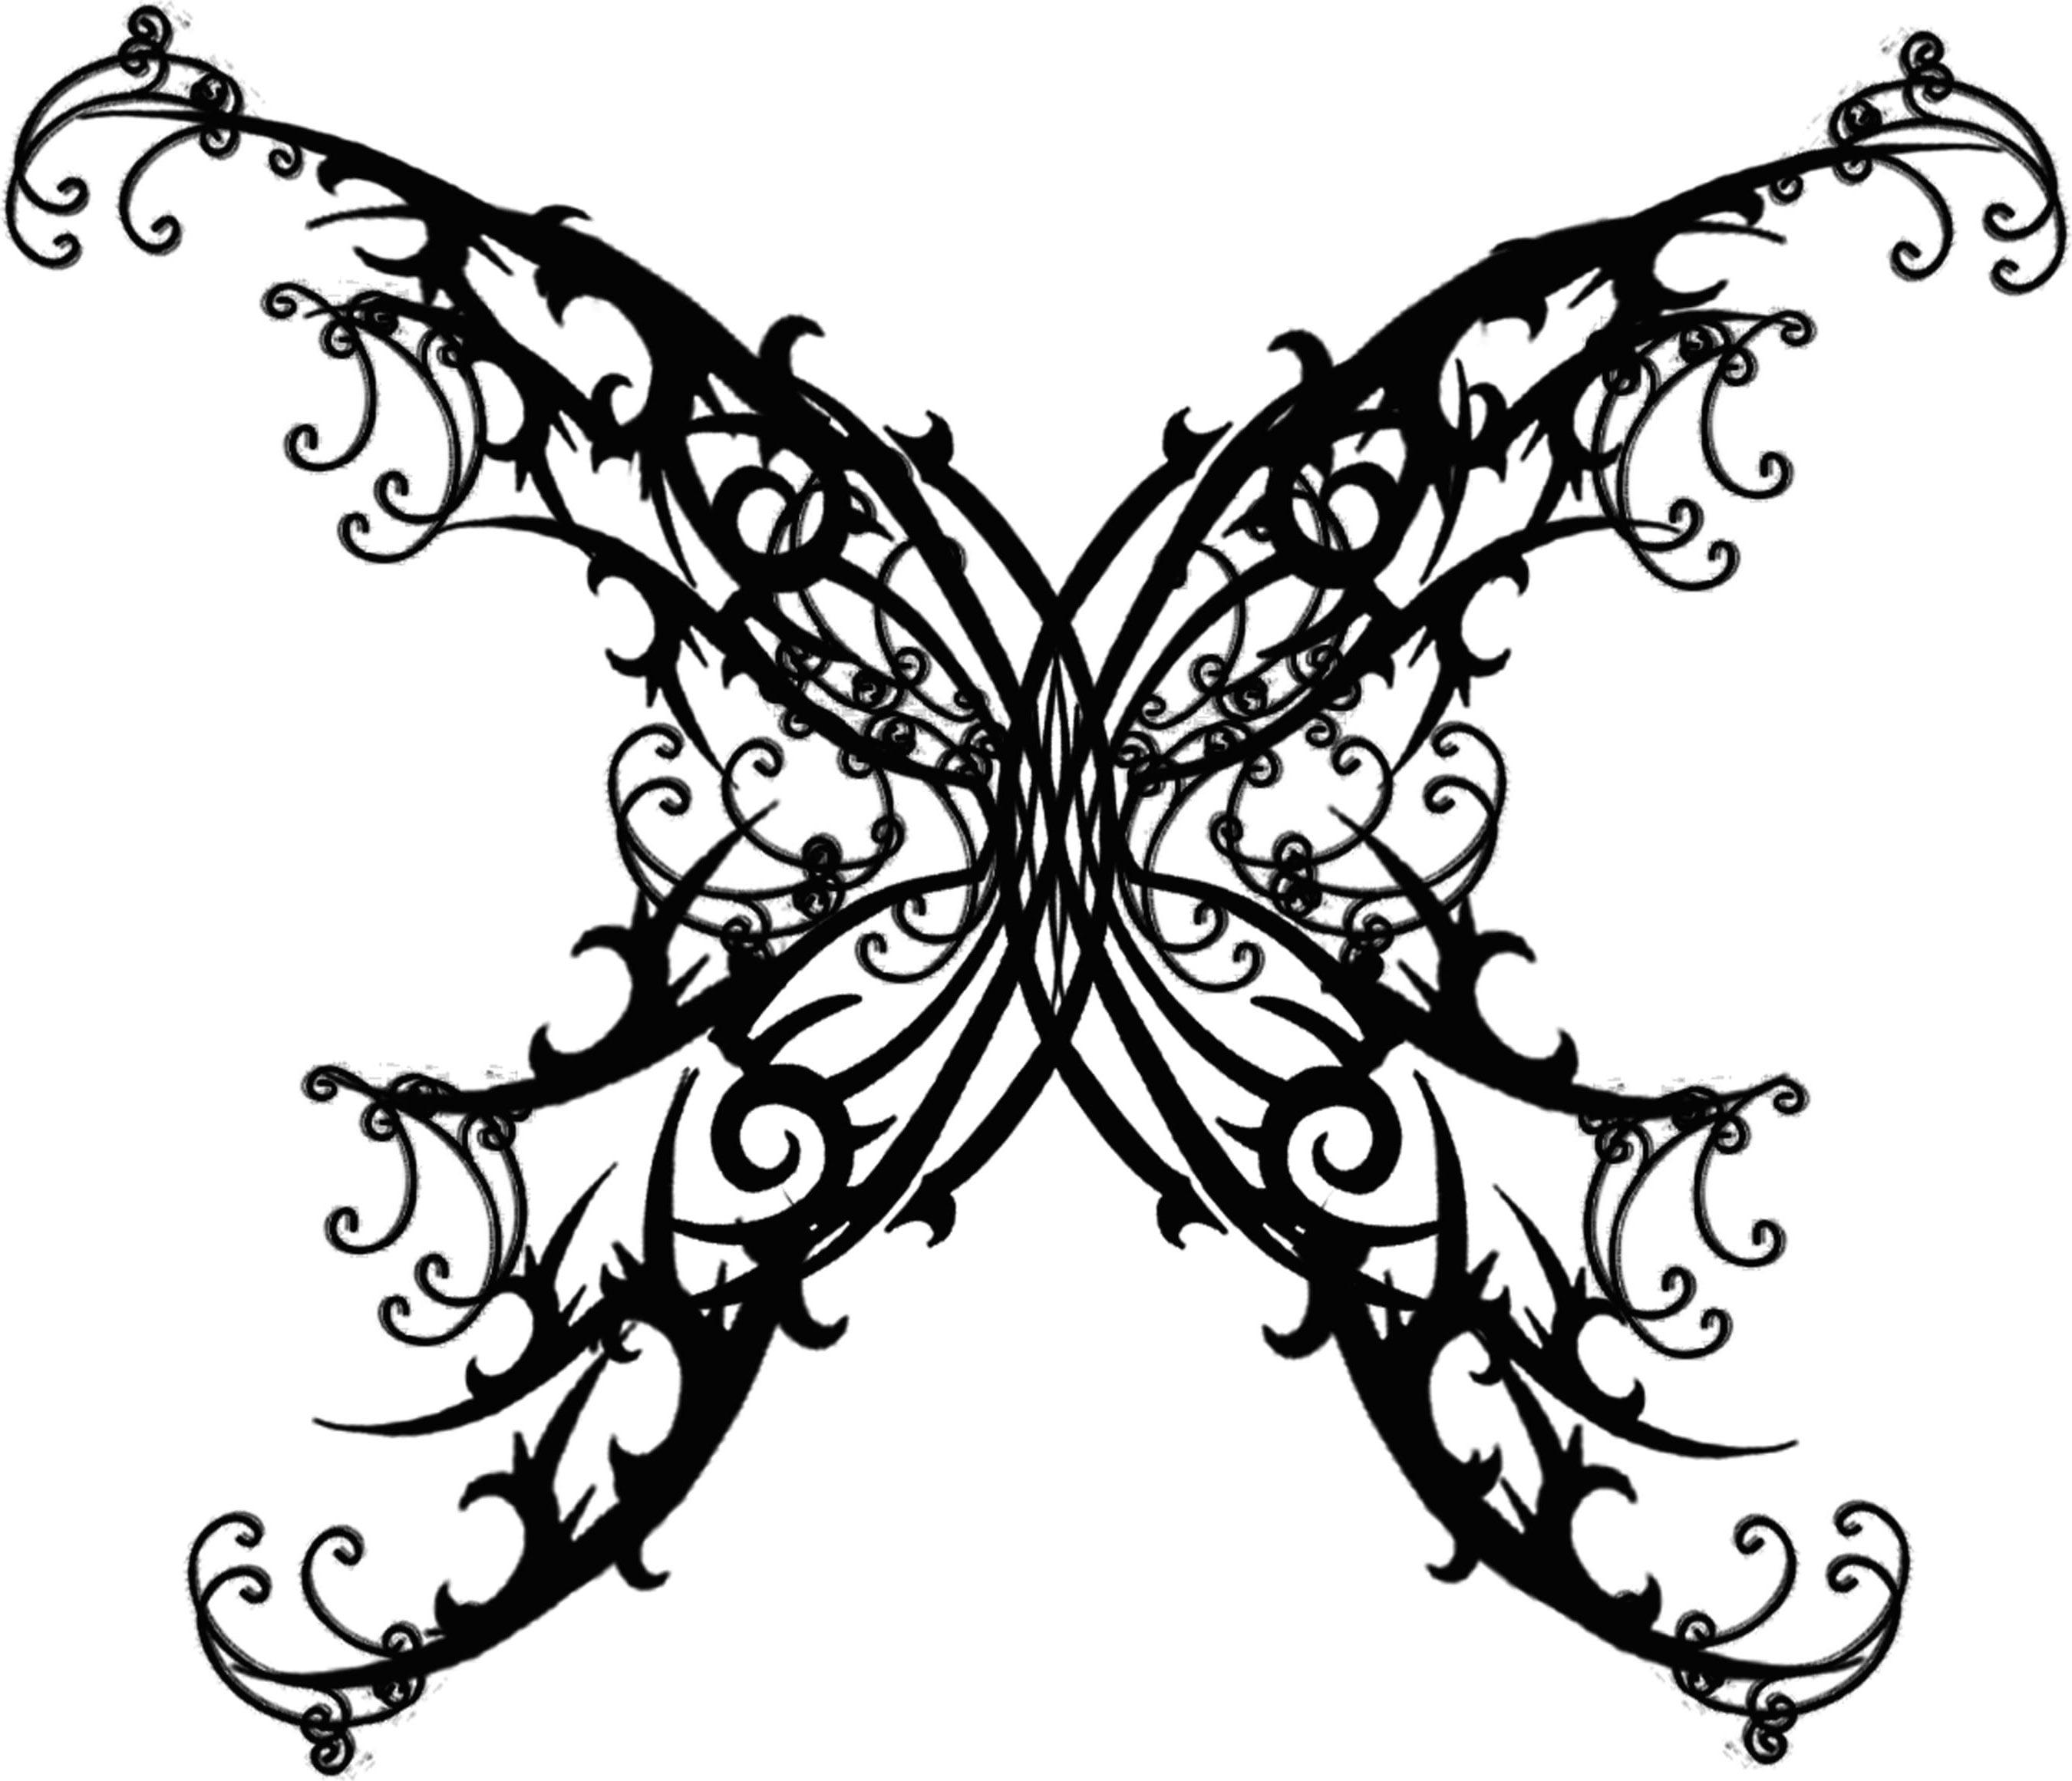 gothic rose tattoo designs cool tattoos bonbaden. Black Bedroom Furniture Sets. Home Design Ideas